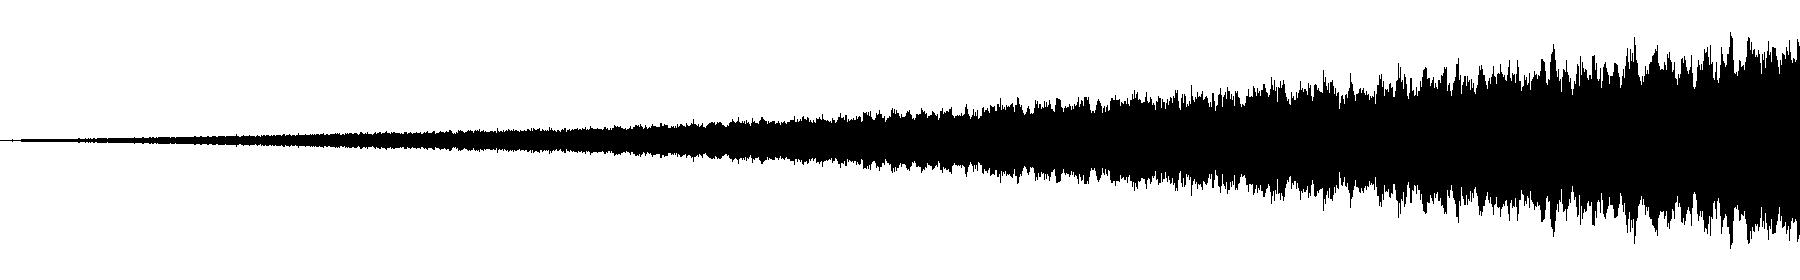 vuf1 128bpm cold chord 16bars d